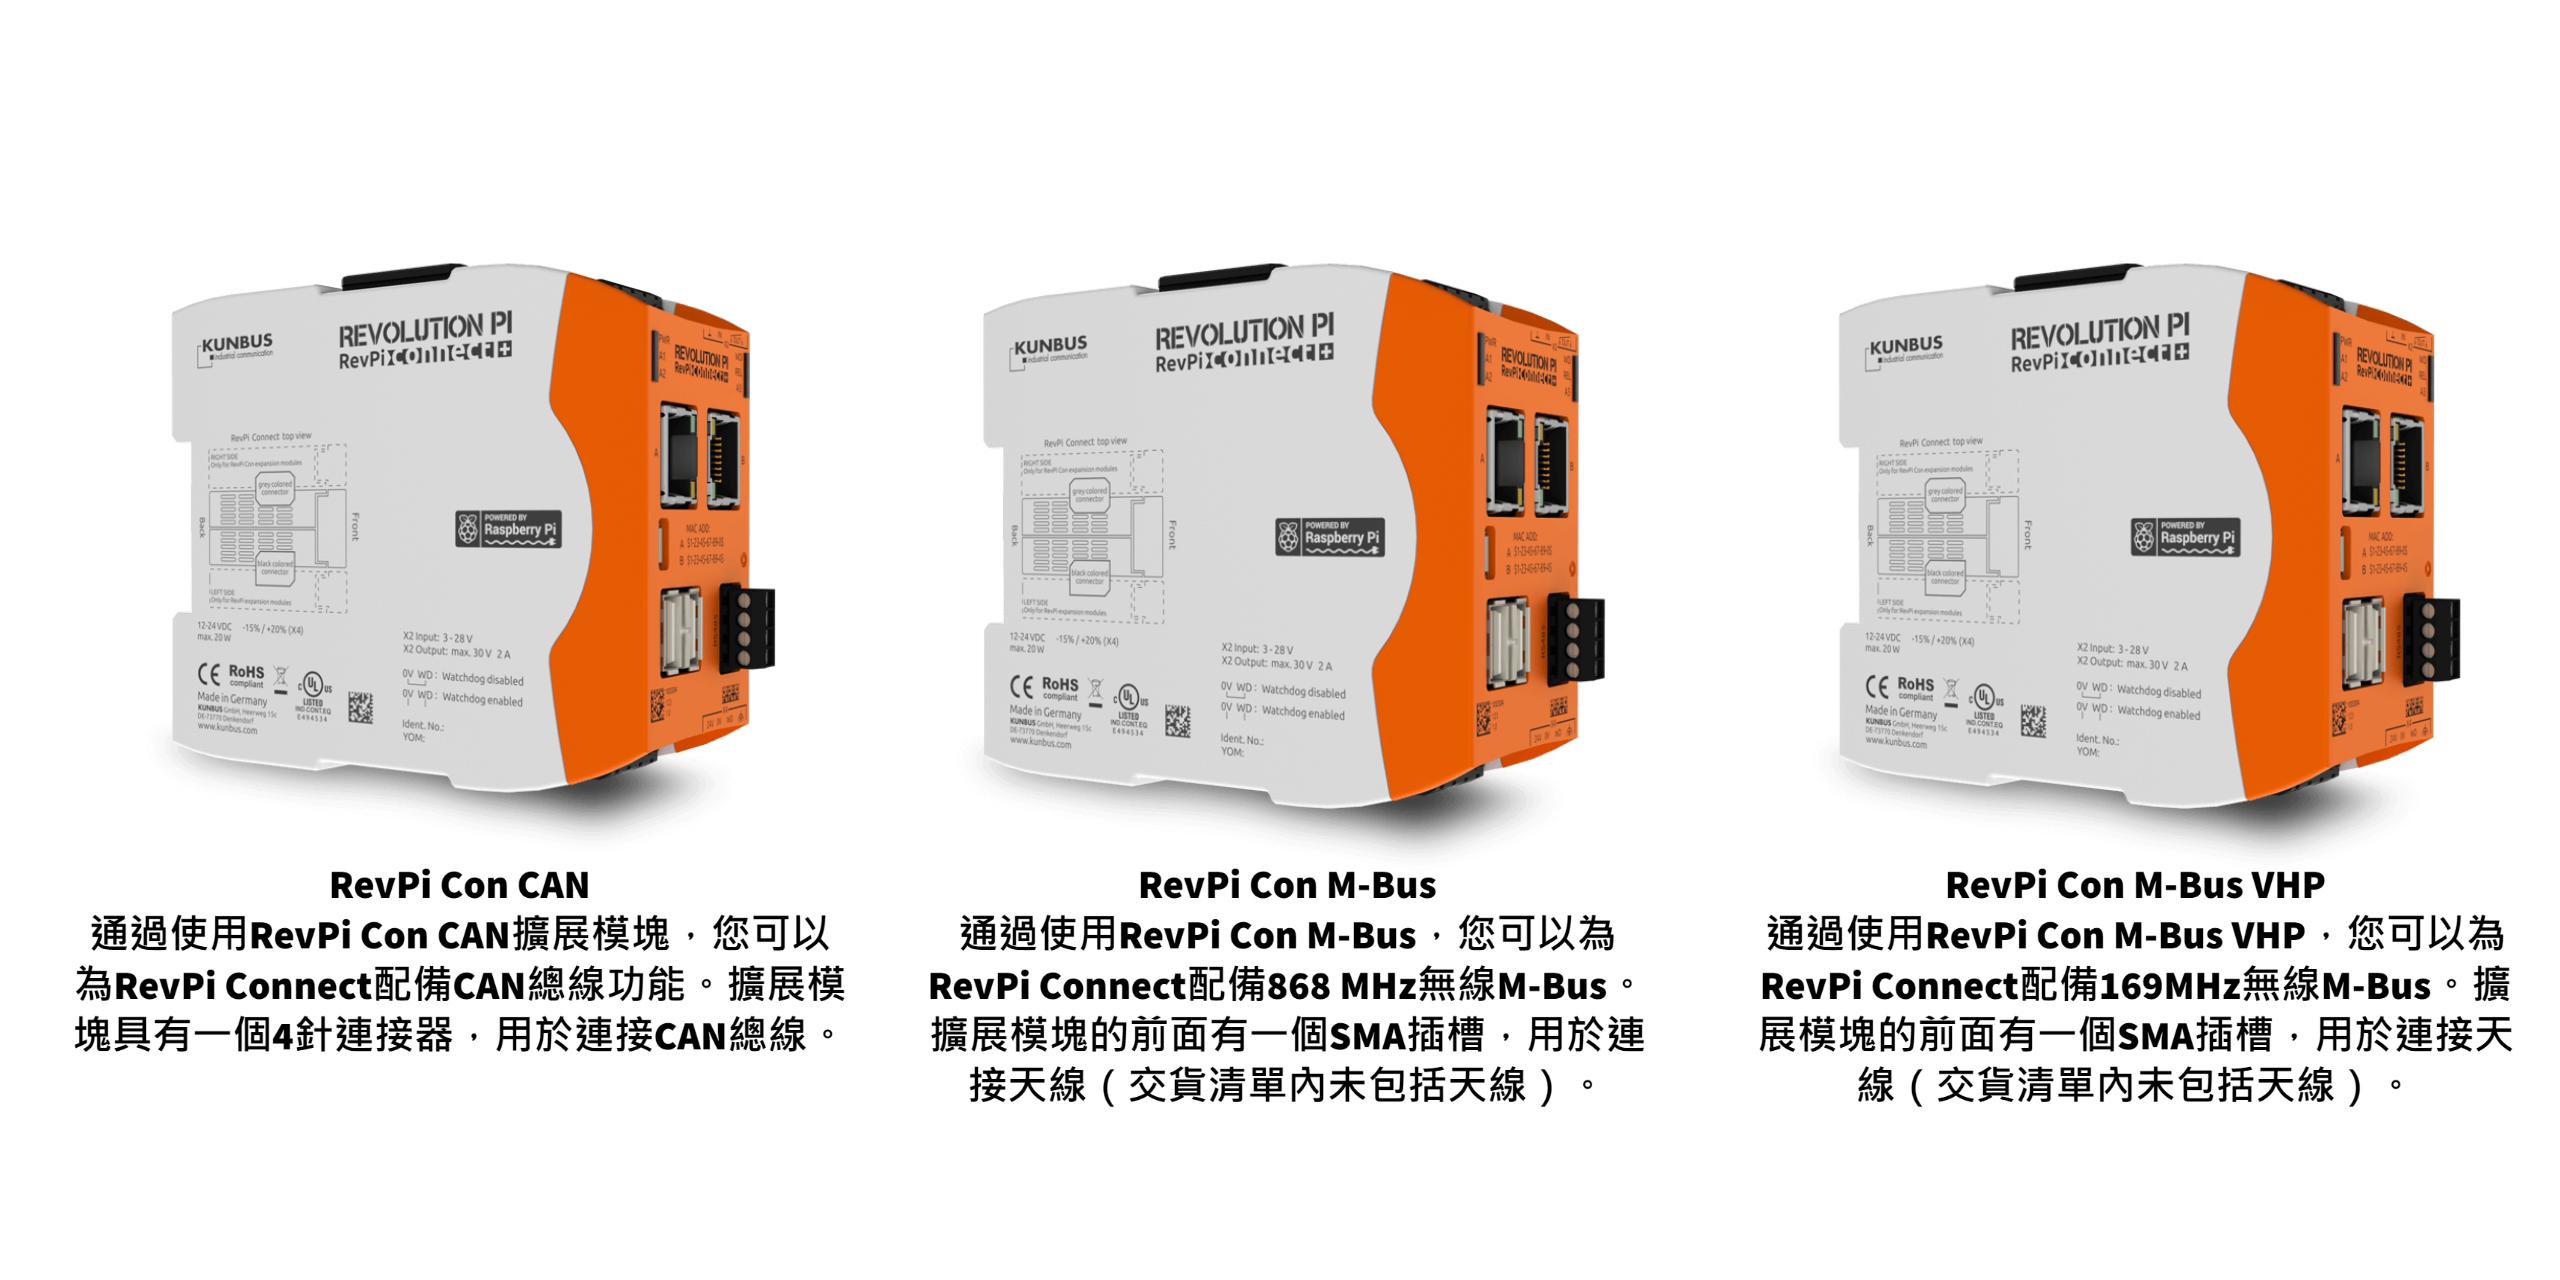 RevPi Con CAN-RevPi Con M-Bus-RevPi Con M-Bus VHP